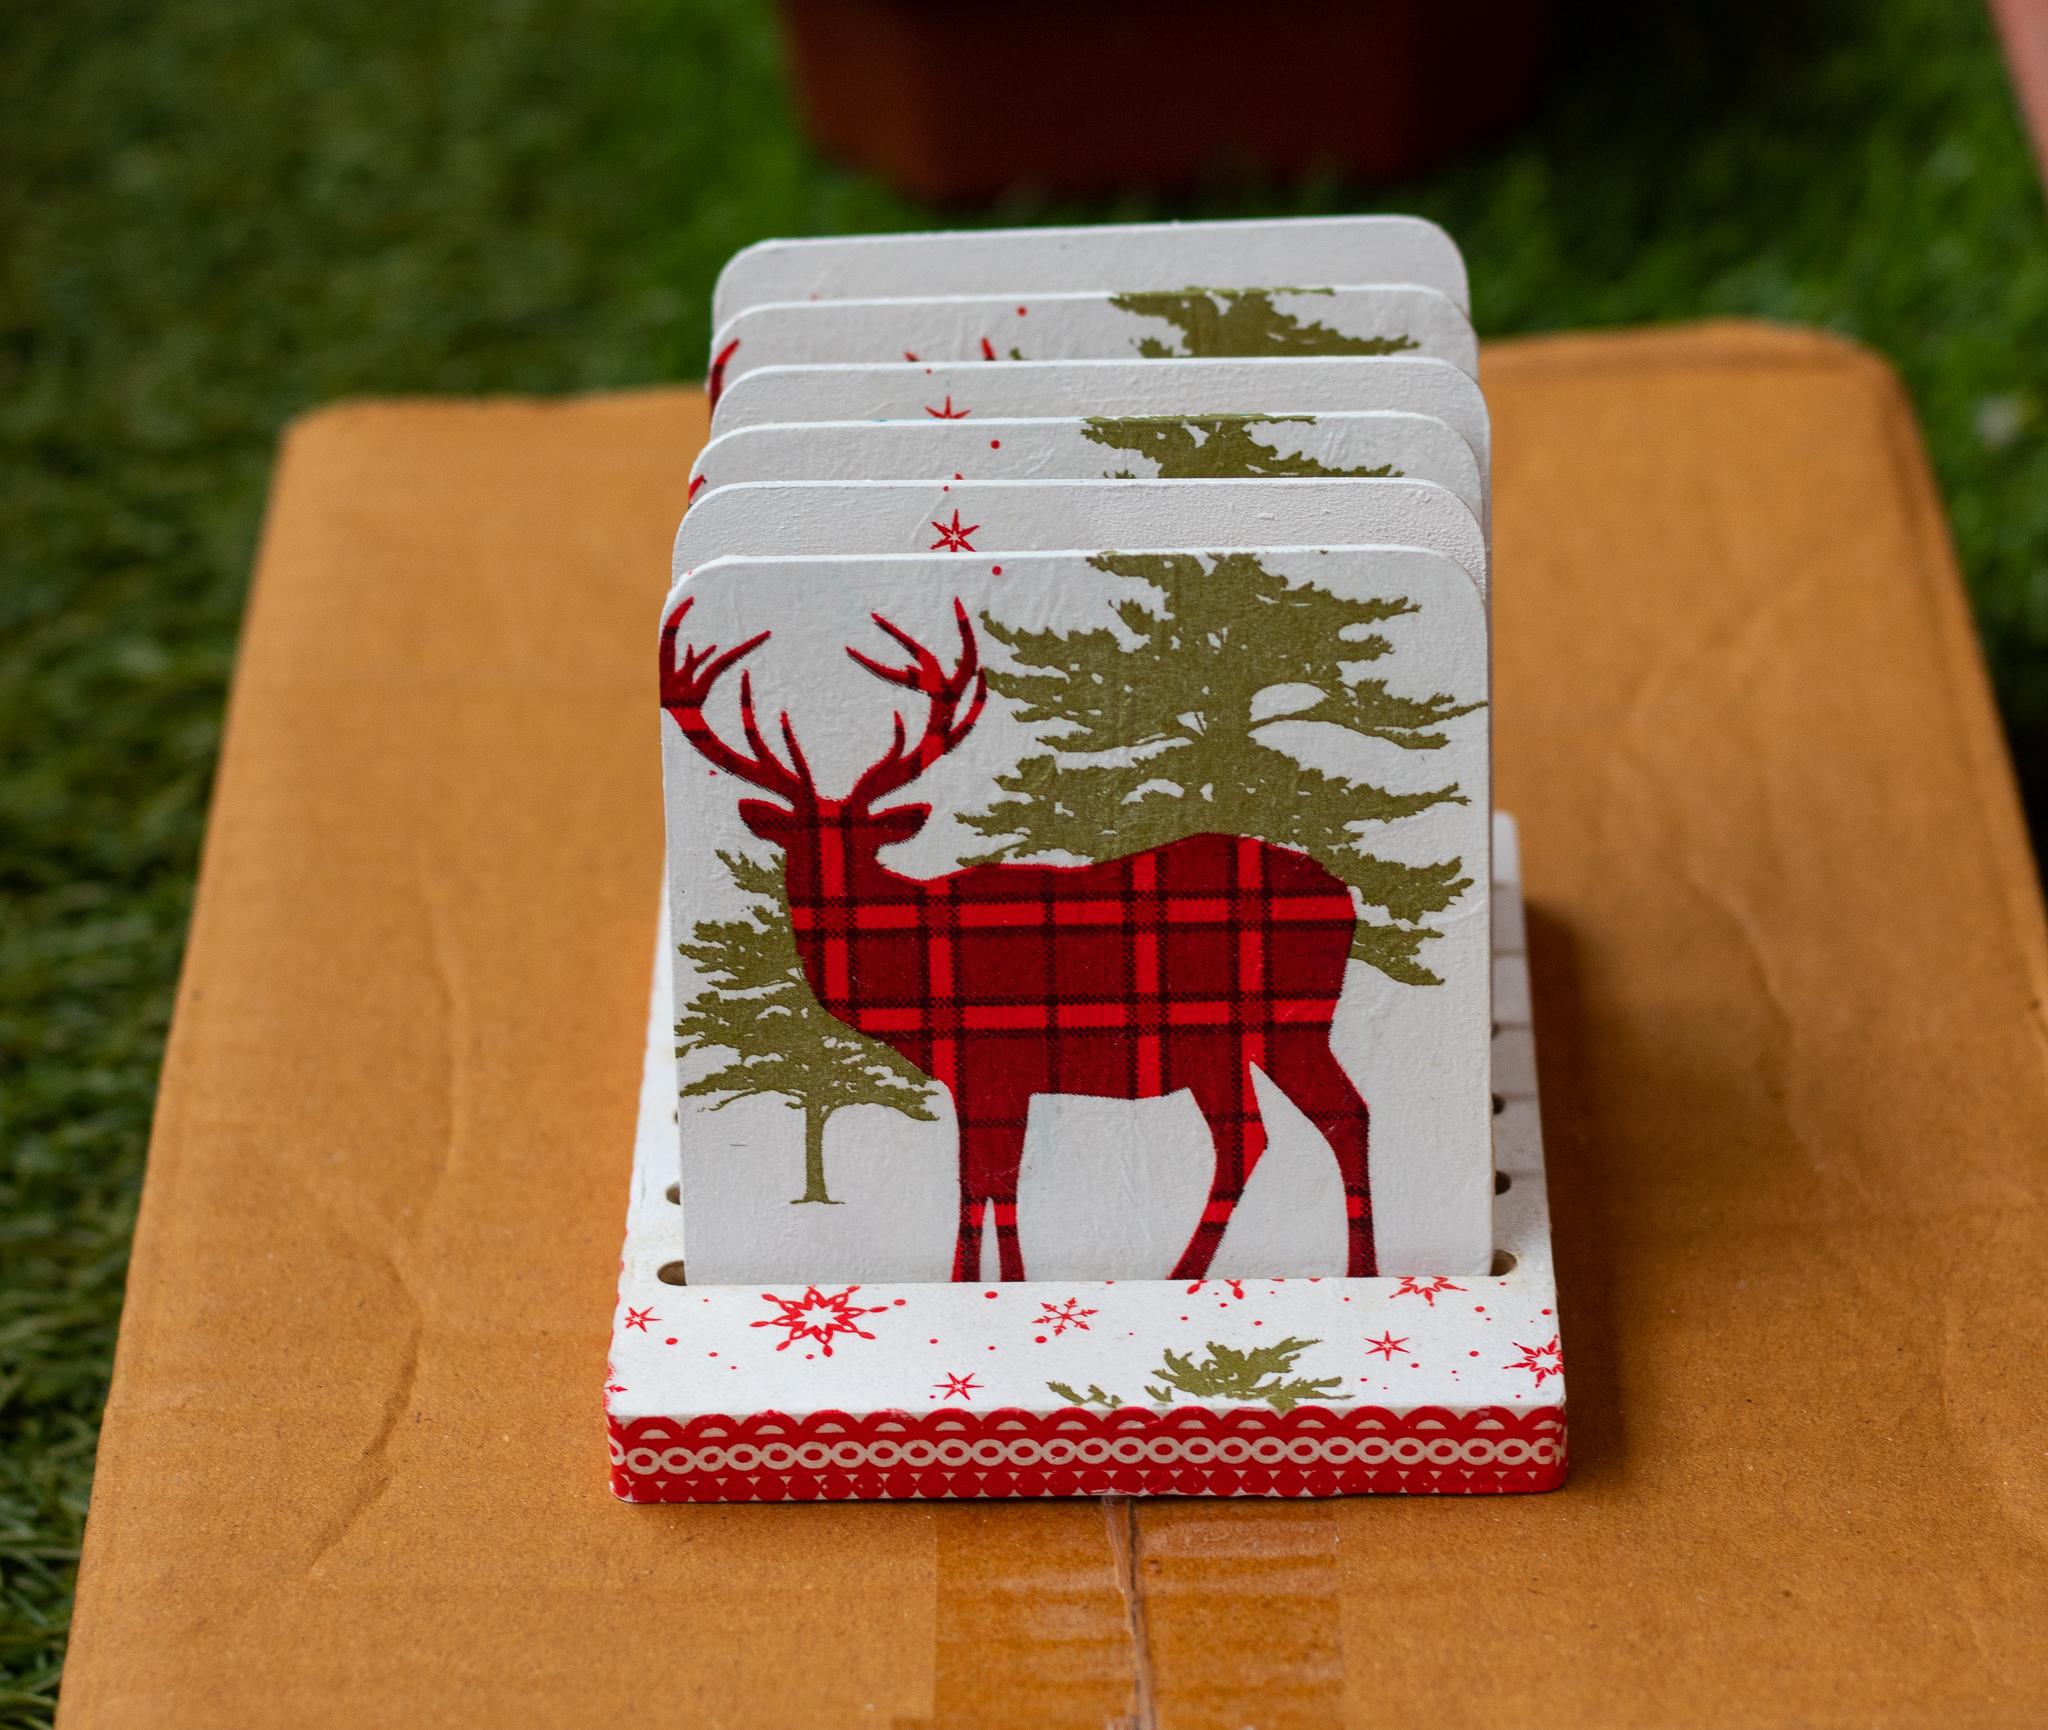 Christmas themed Coaster set